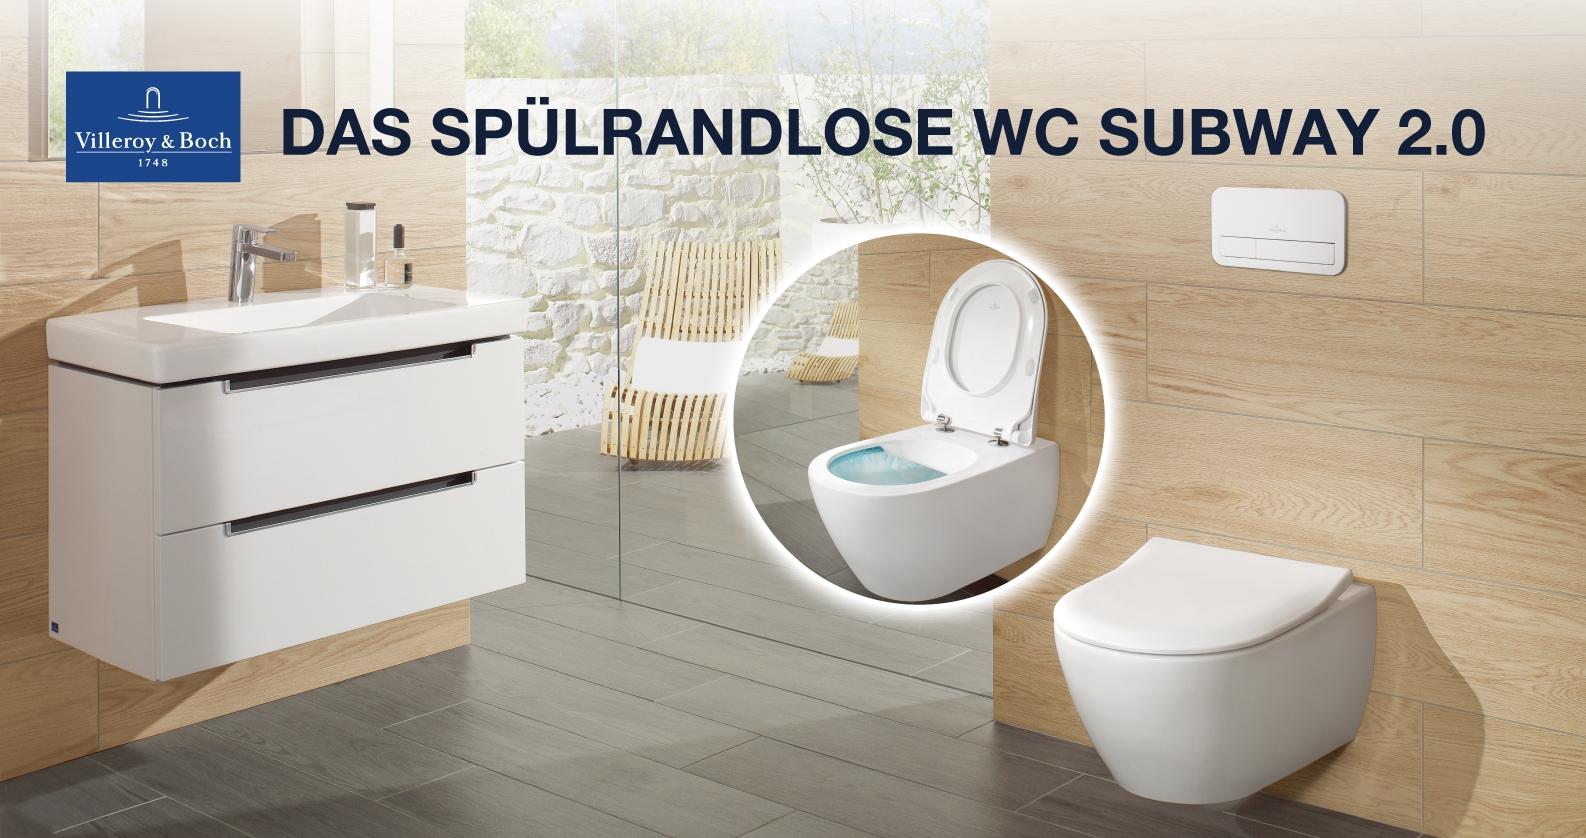 Das spülrandlose WC Subway 2.0 von Villeroy & Boch